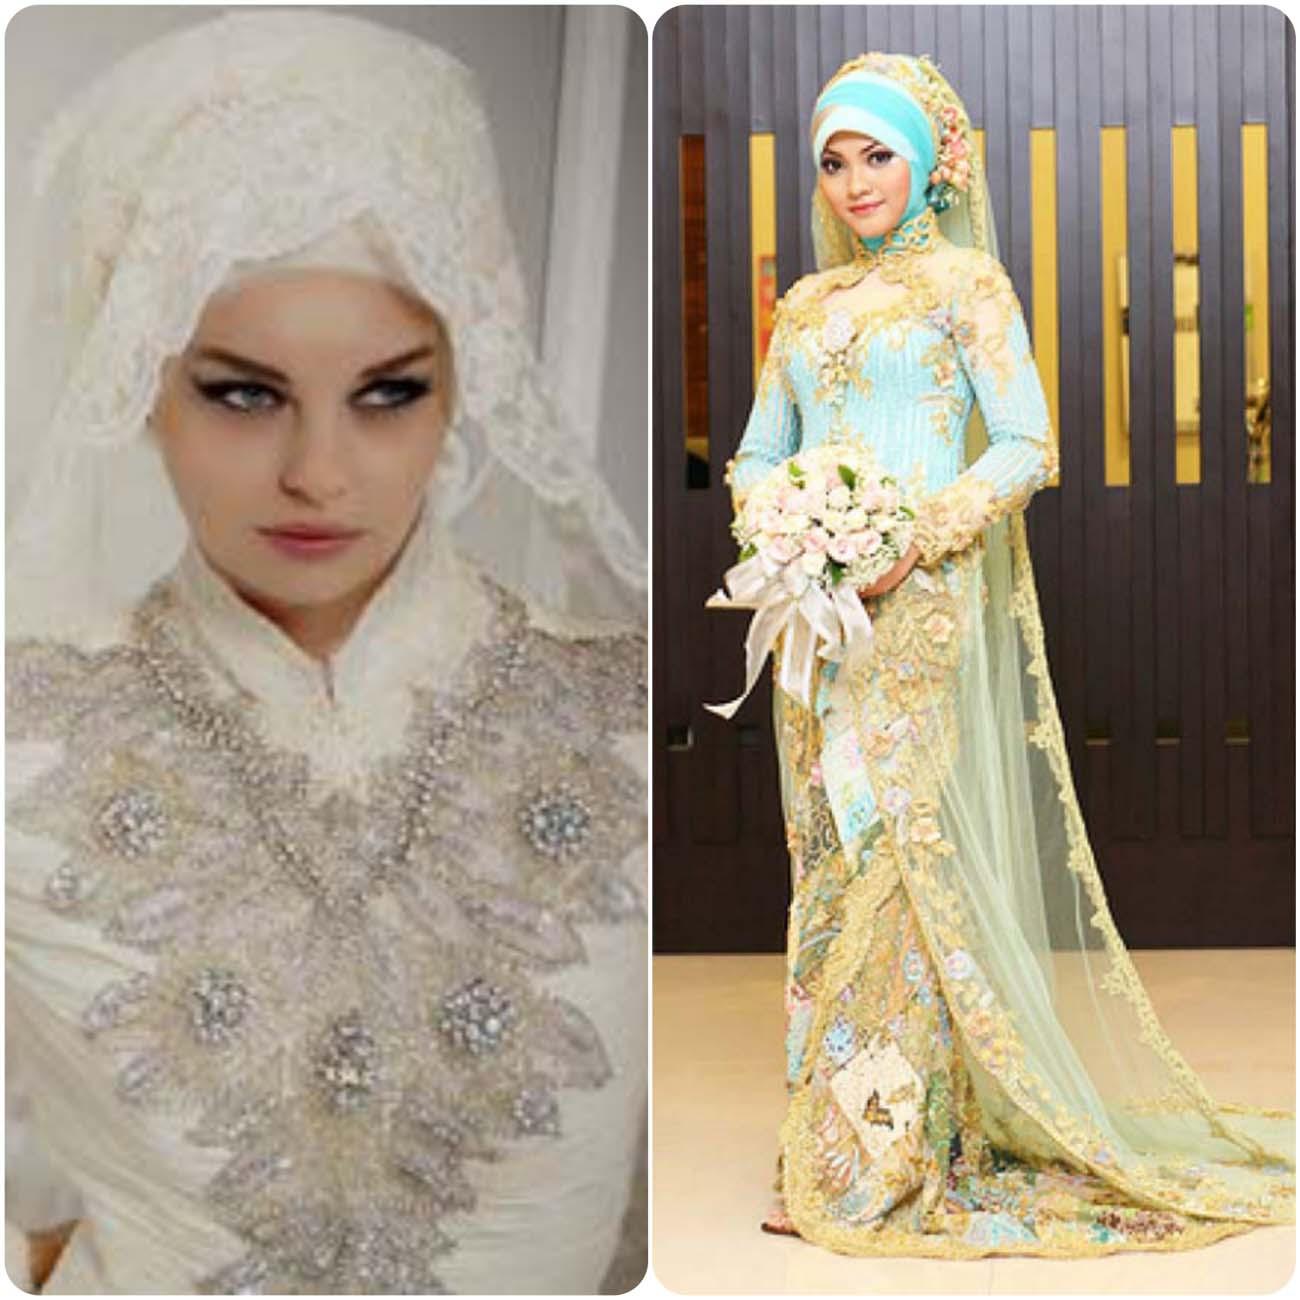 Designers Abaya Dresses Designs For Wedding Bridals 2016-2017...styloplanet (17)